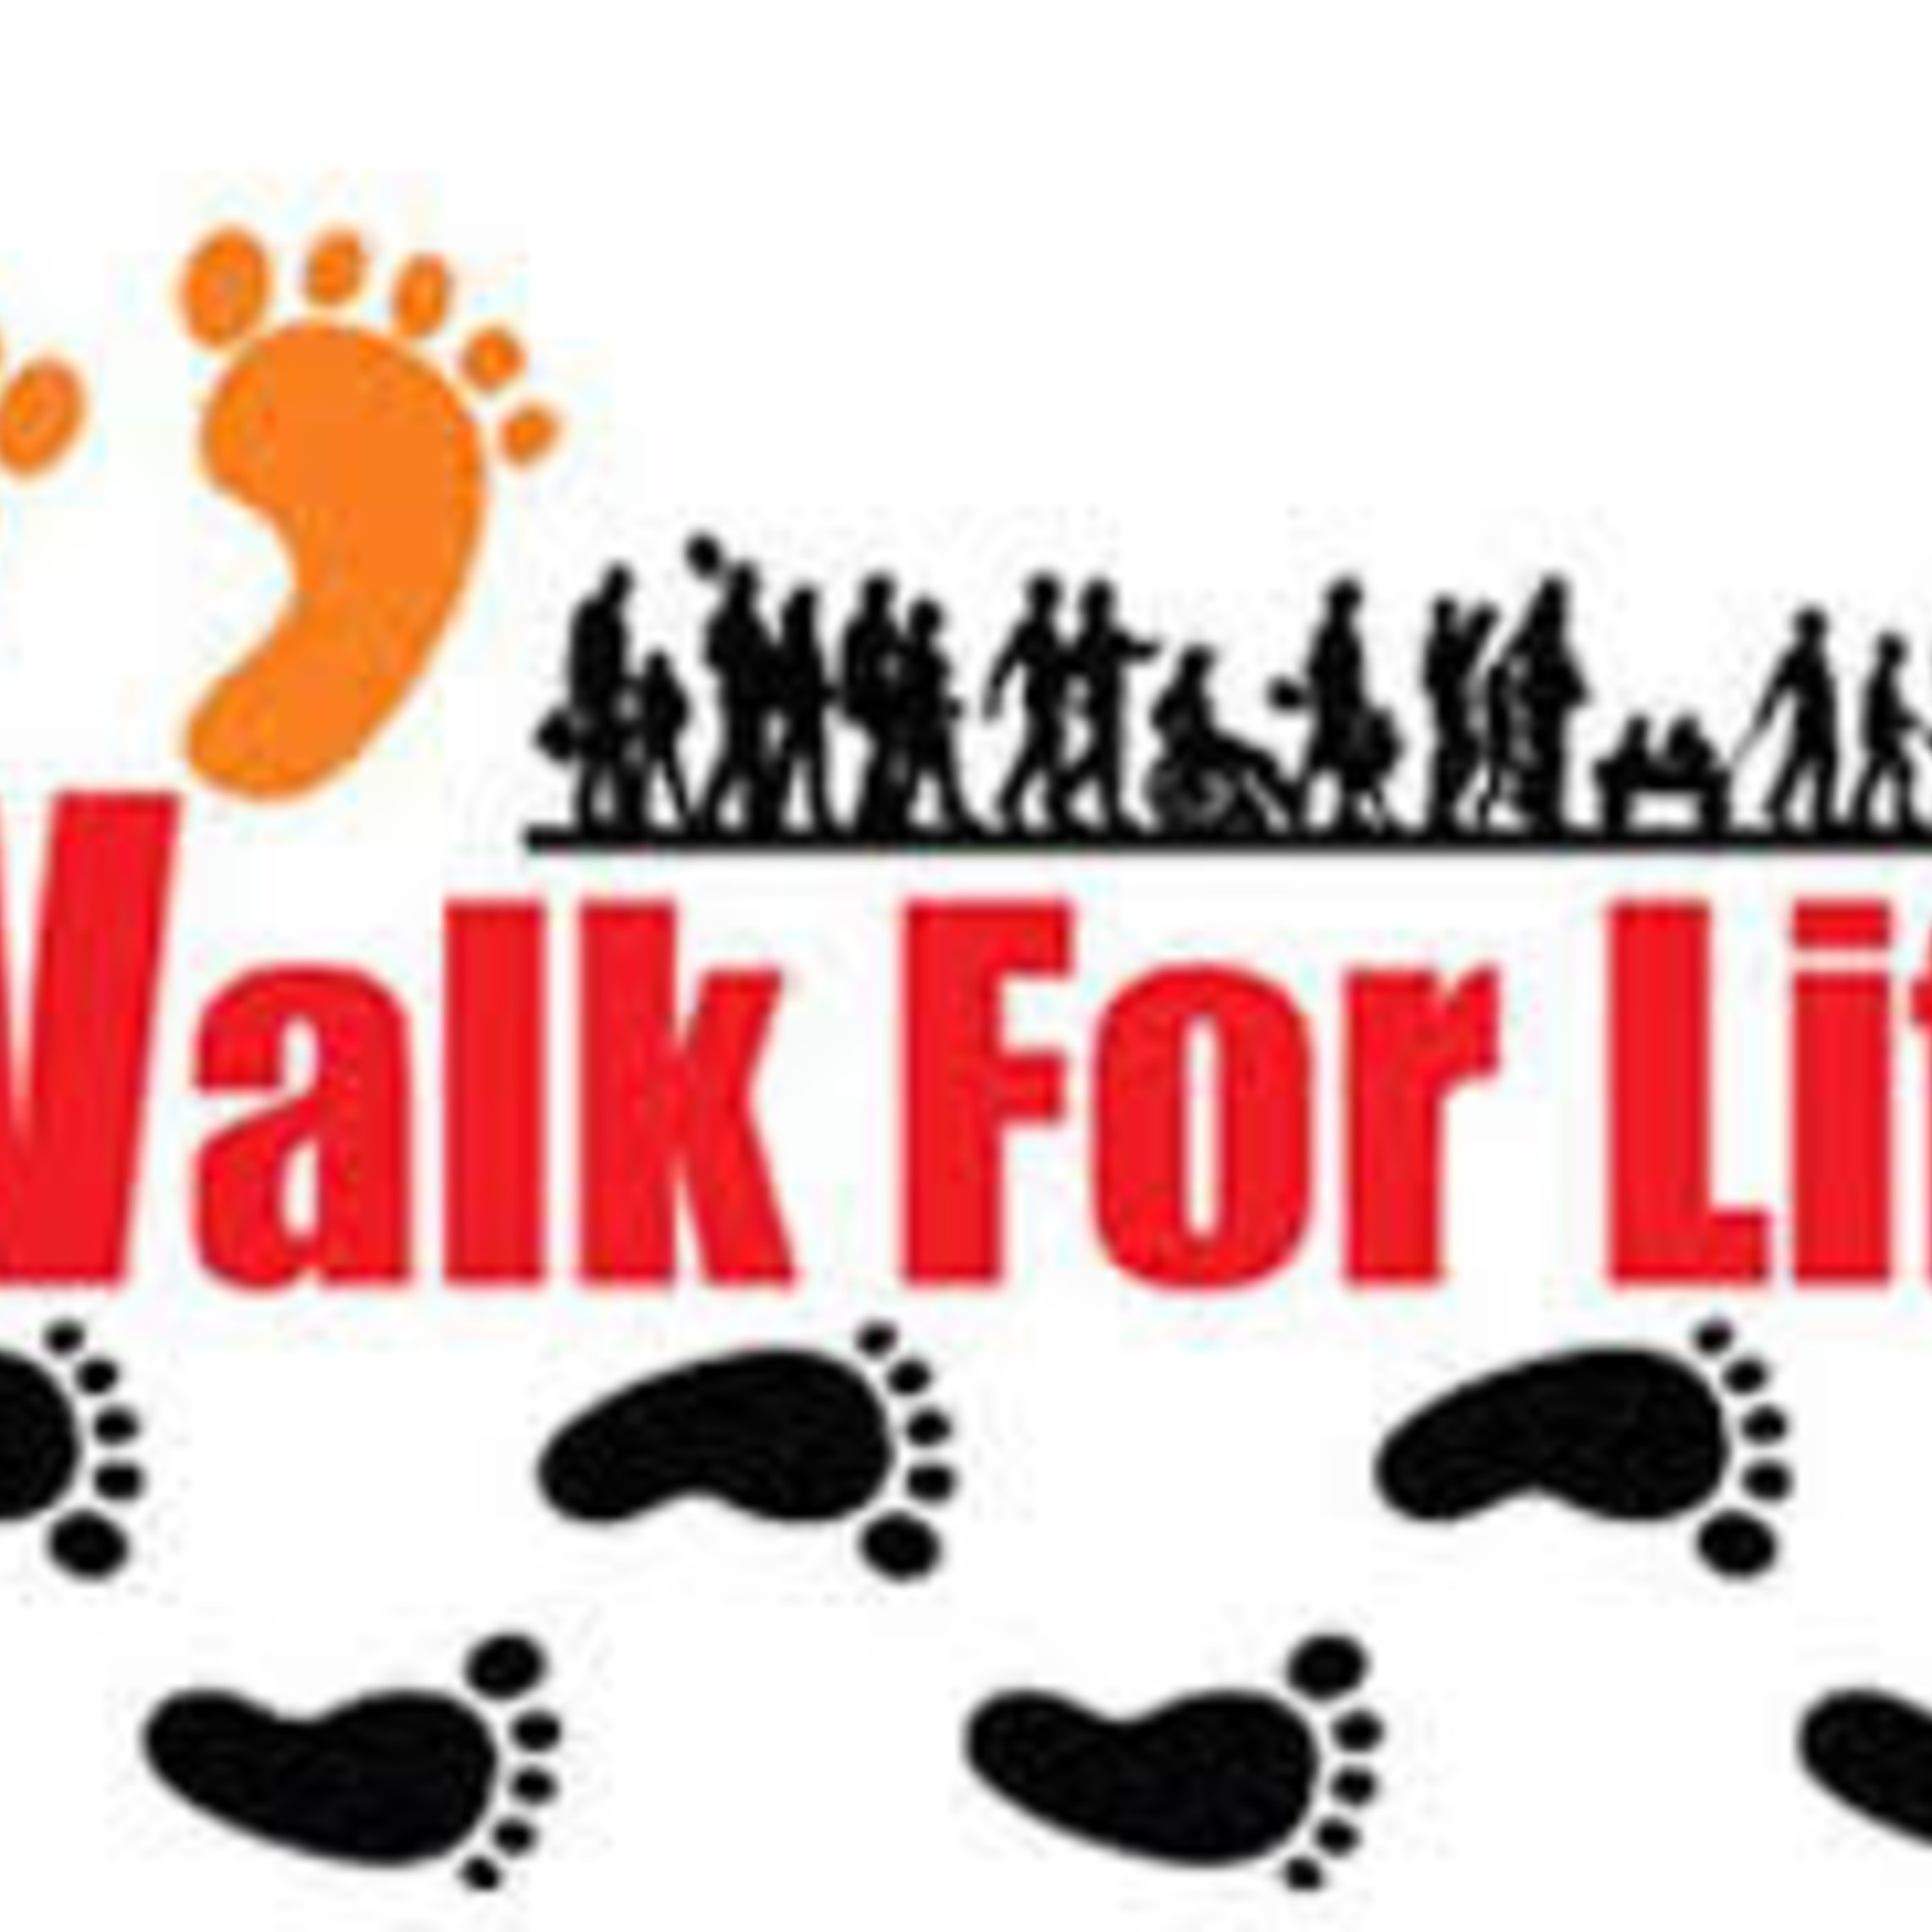 Walk For Life Image